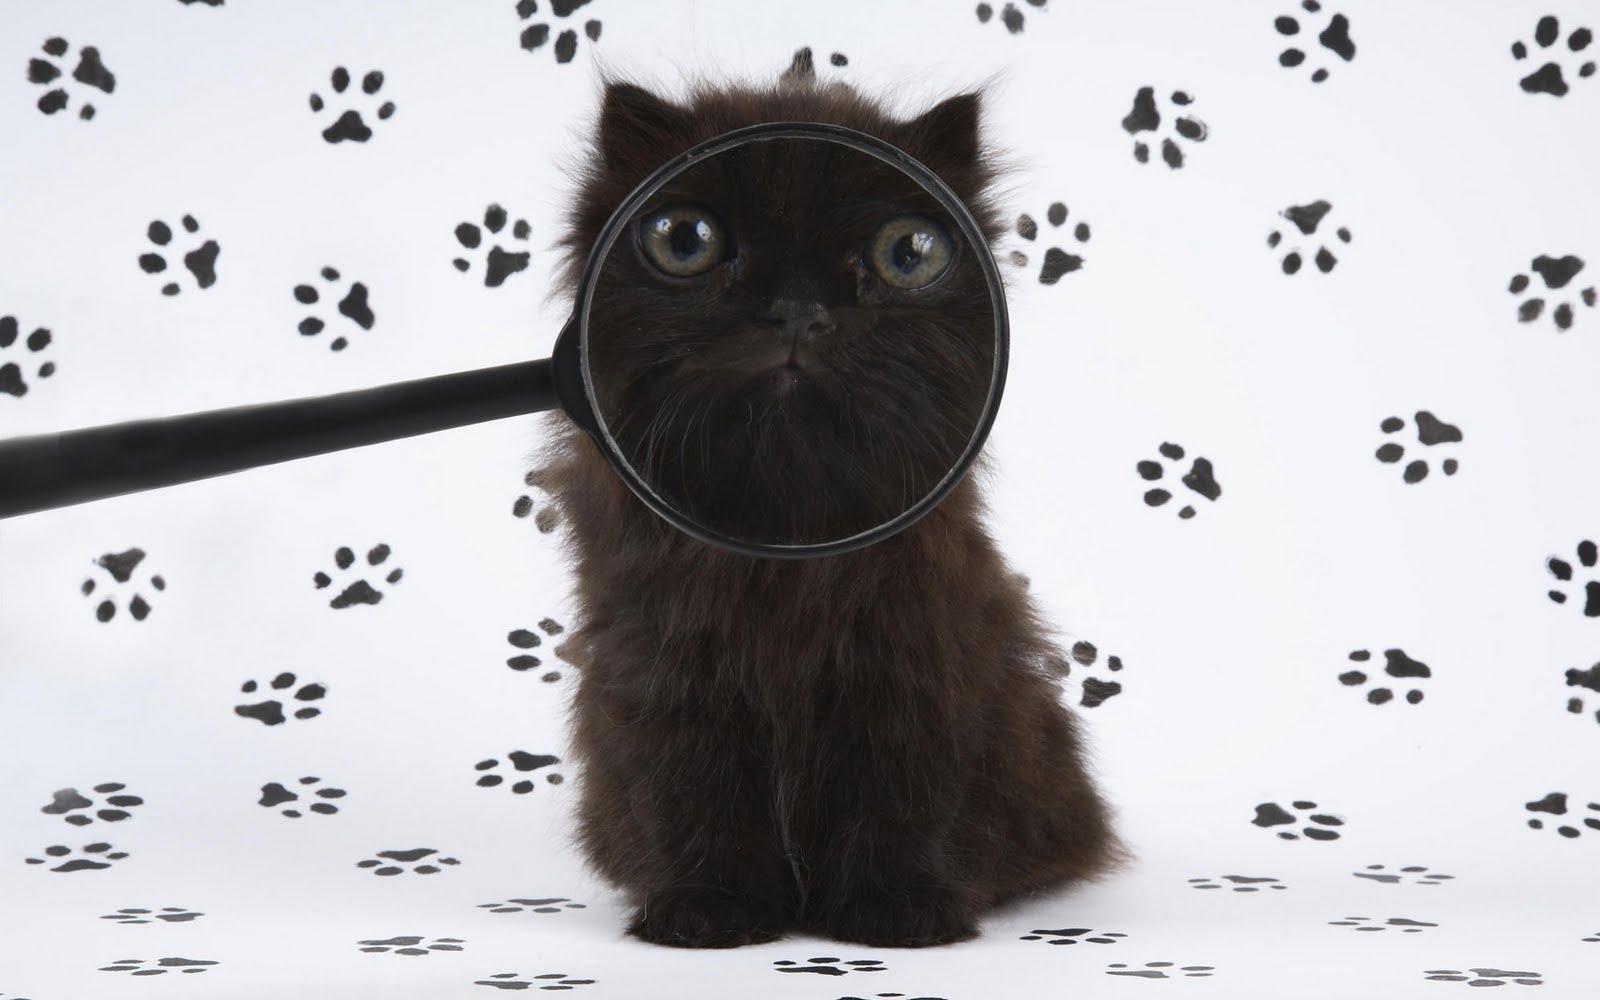 http://3.bp.blogspot.com/_KLJU3hHDGVM/S-lC_f6Wp9I/AAAAAAAAB-o/dkP6X6uVOgY/s1600/cats+%287%29.jpg